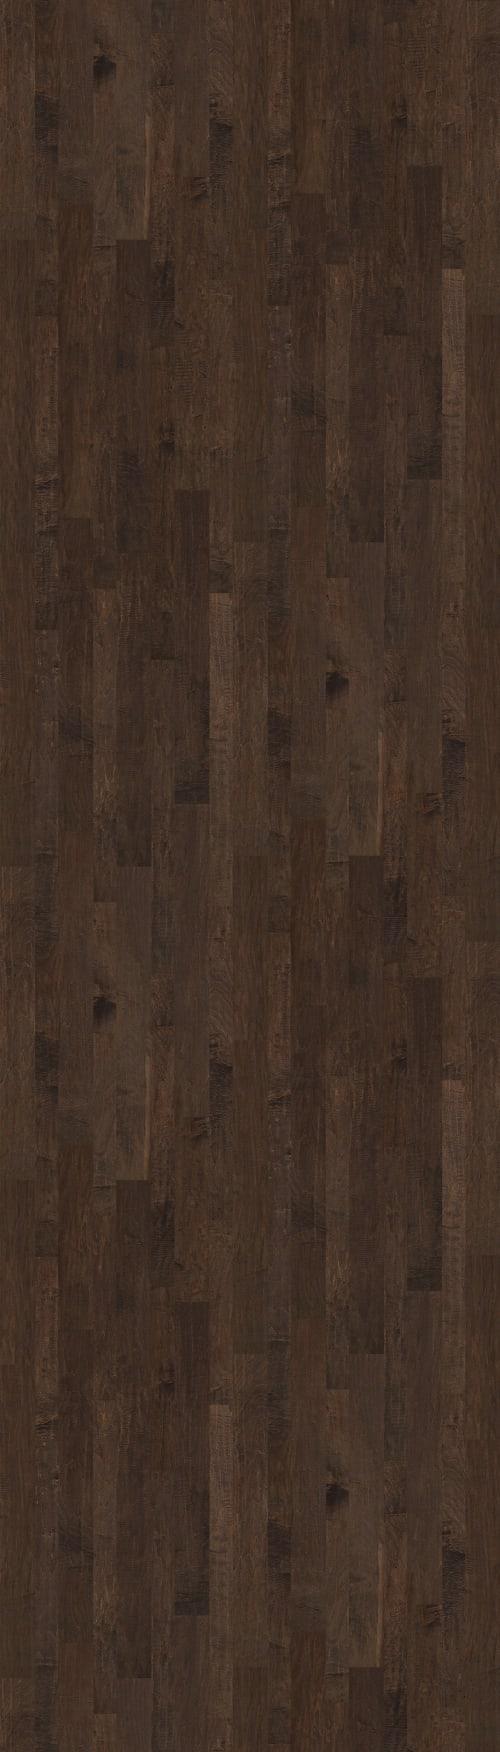 Bennington Maple in Turnpike - Hardwood by Shaw Flooring